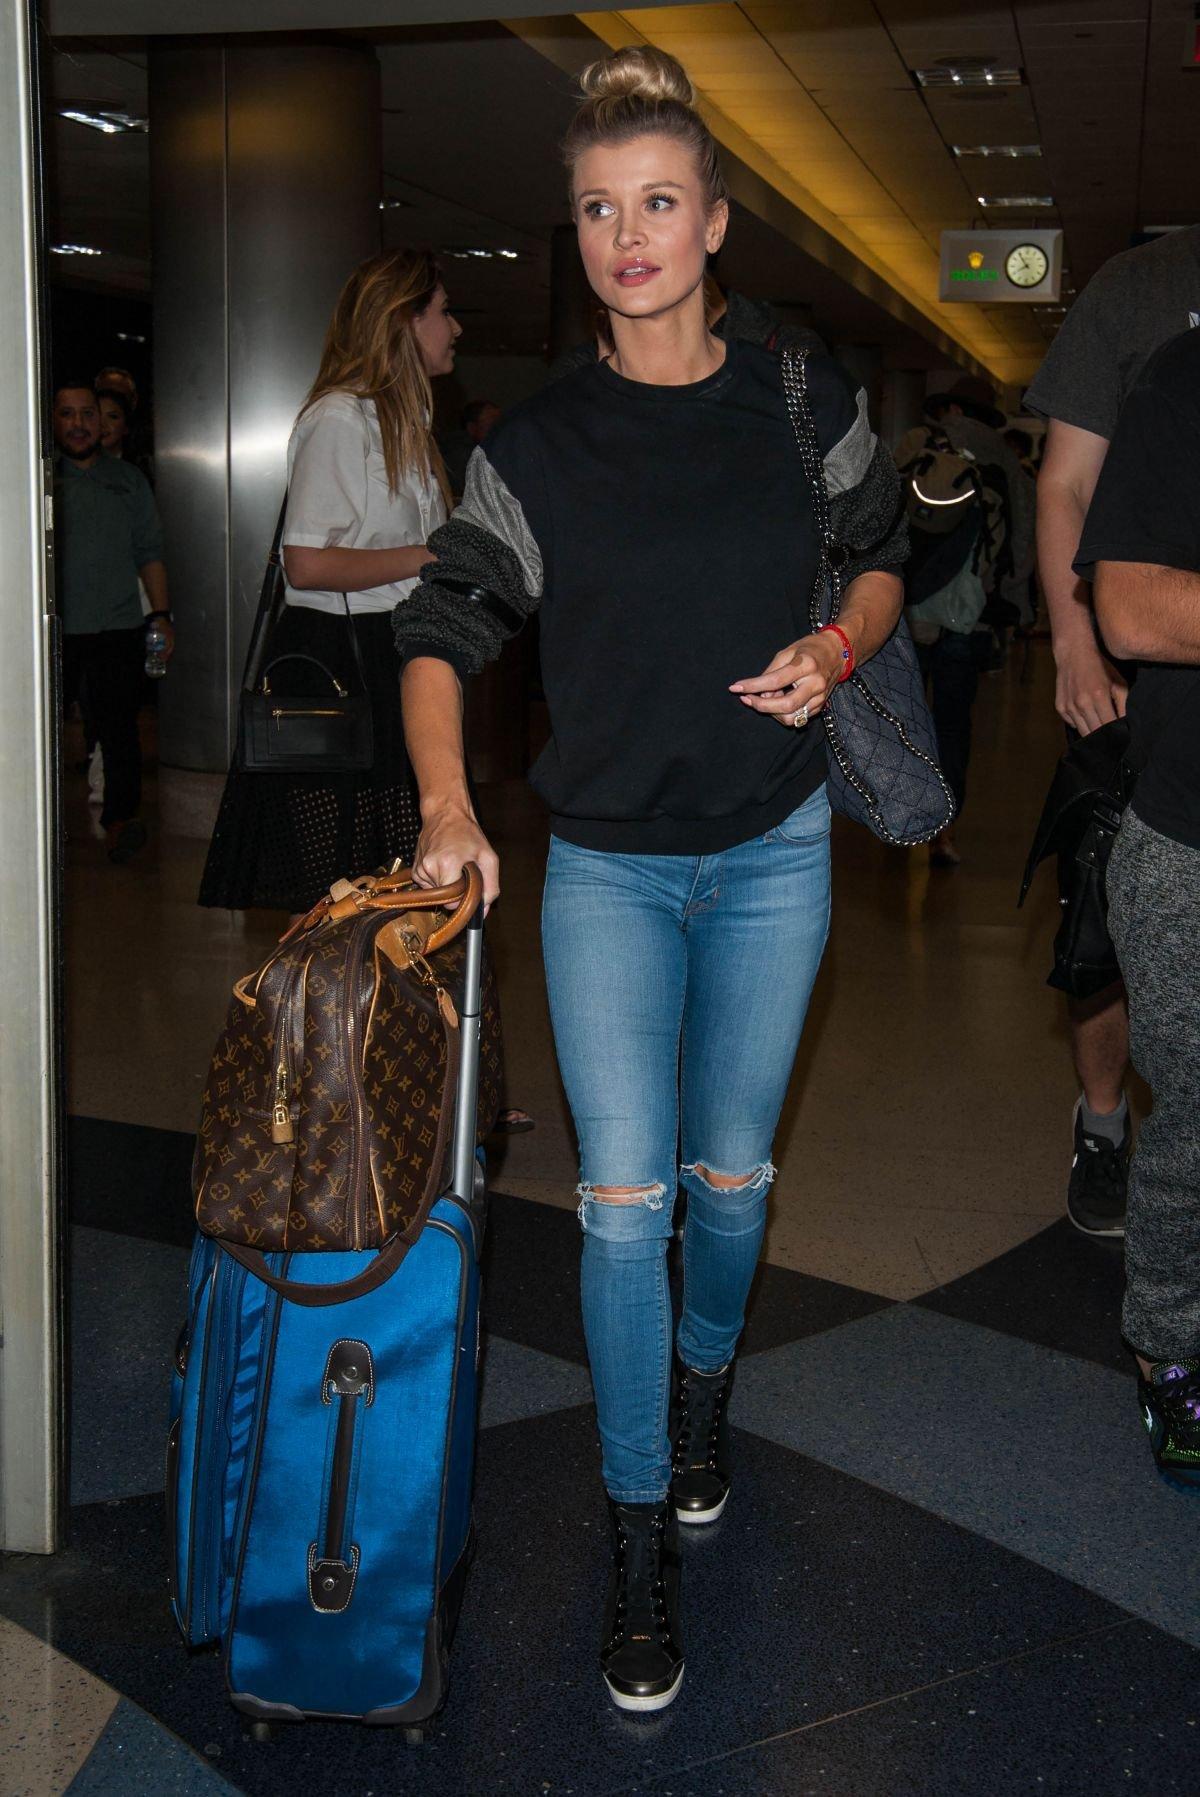 Джоанна Крупа блеснула в аэропорту